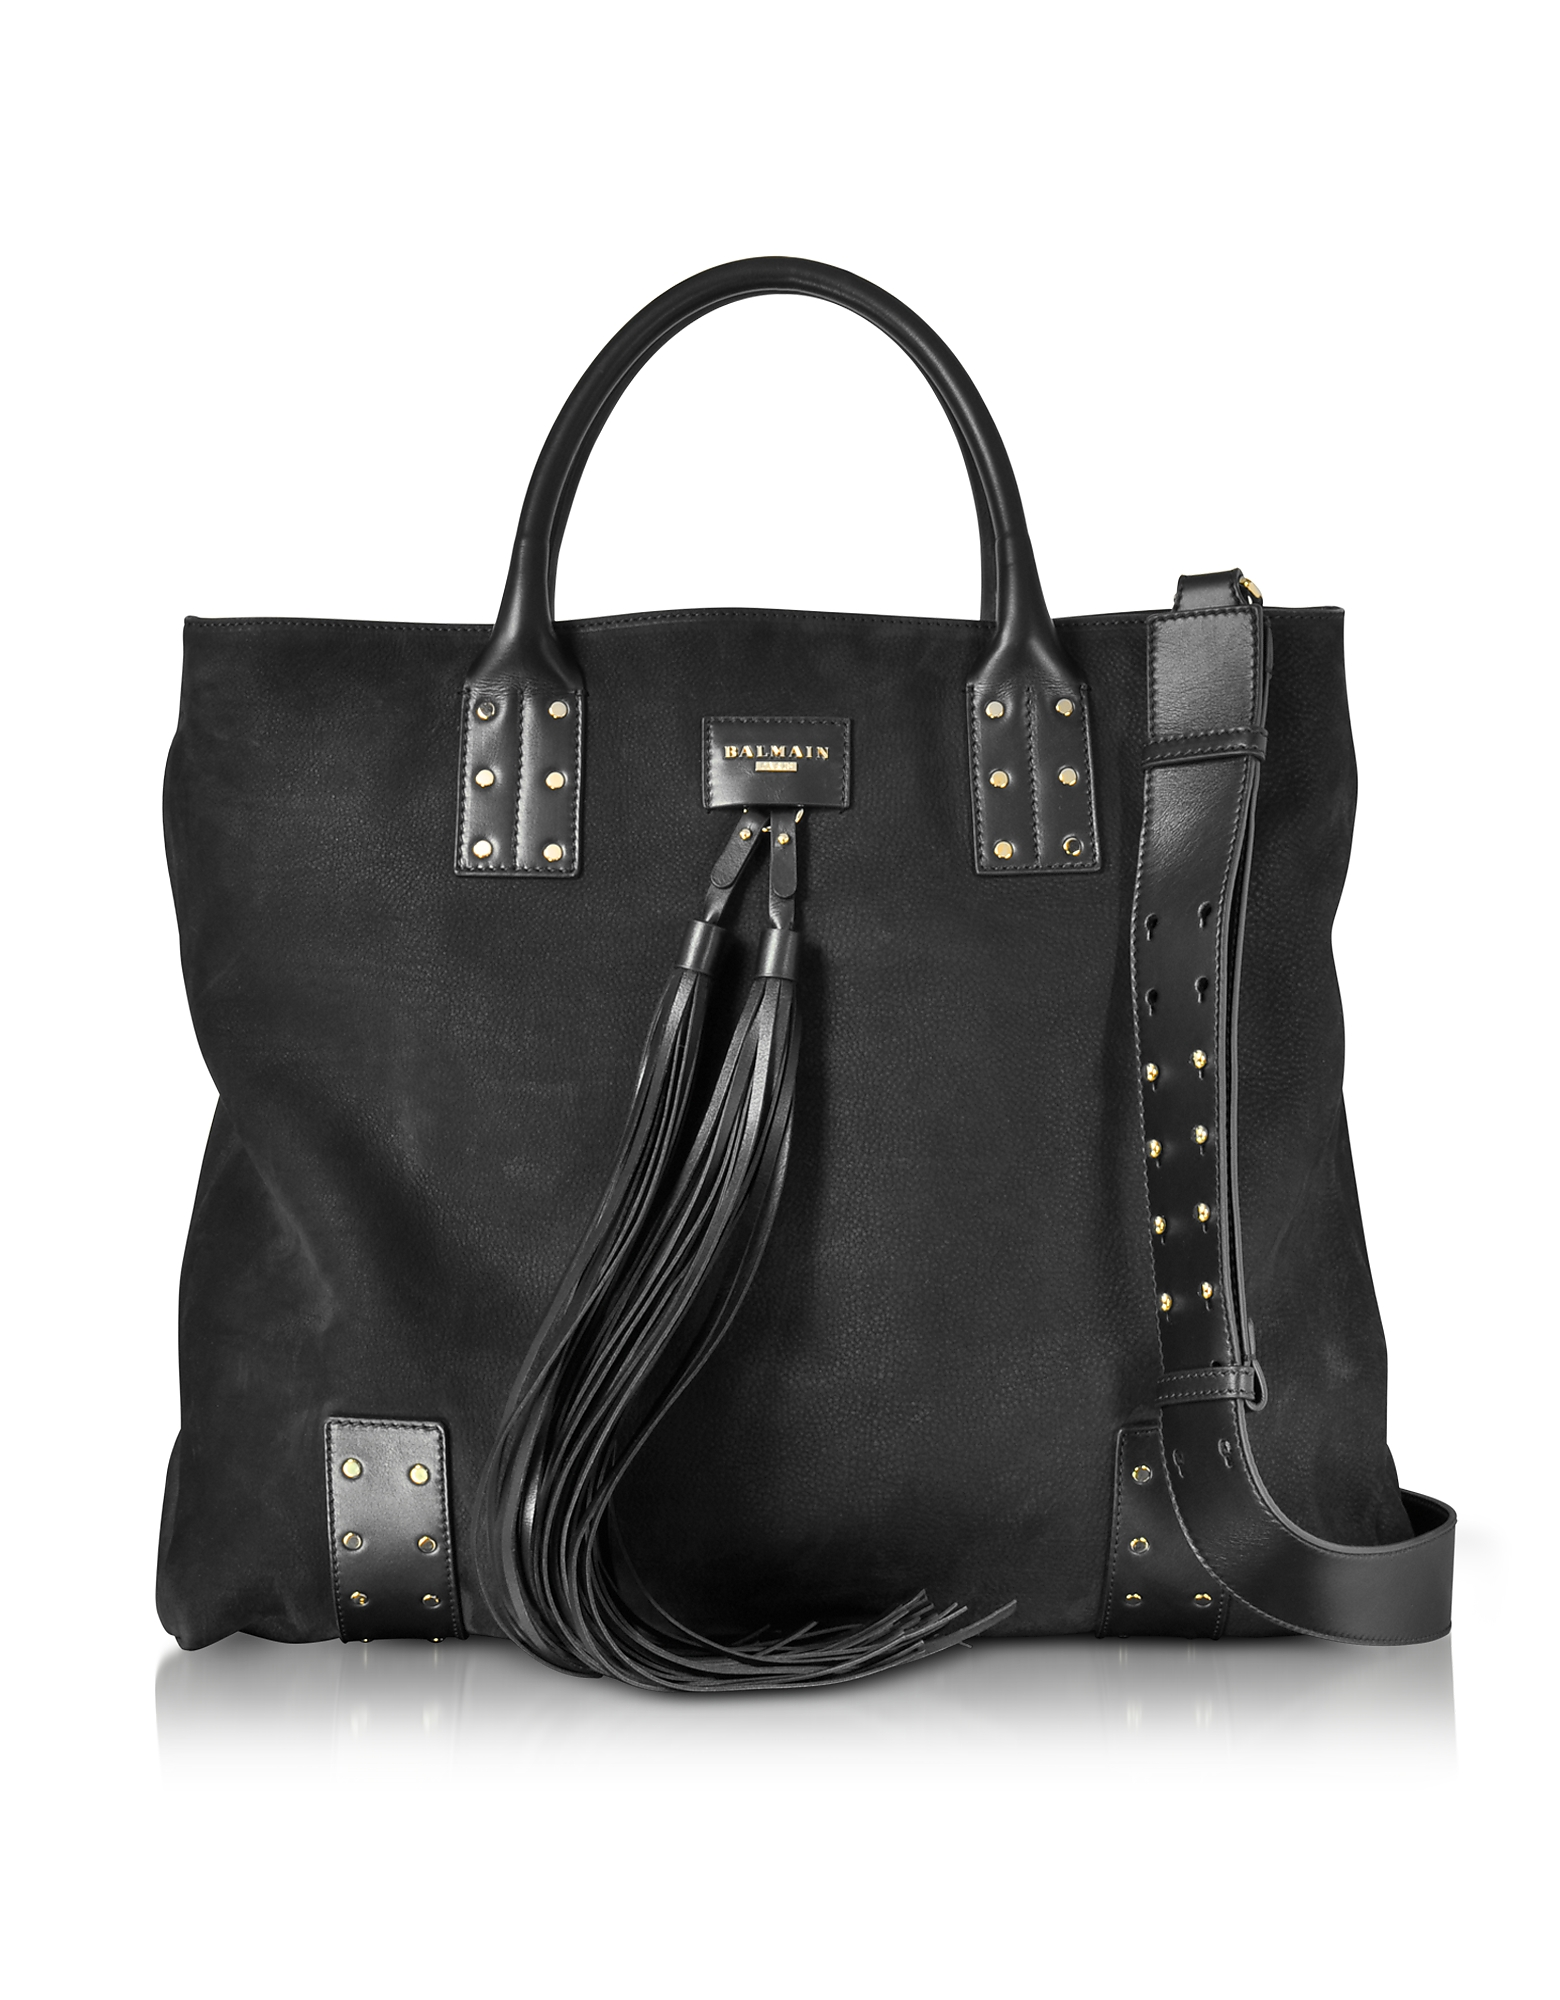 Balmain Men's Bags, Domaine Nubuck Men's Shopping Bag